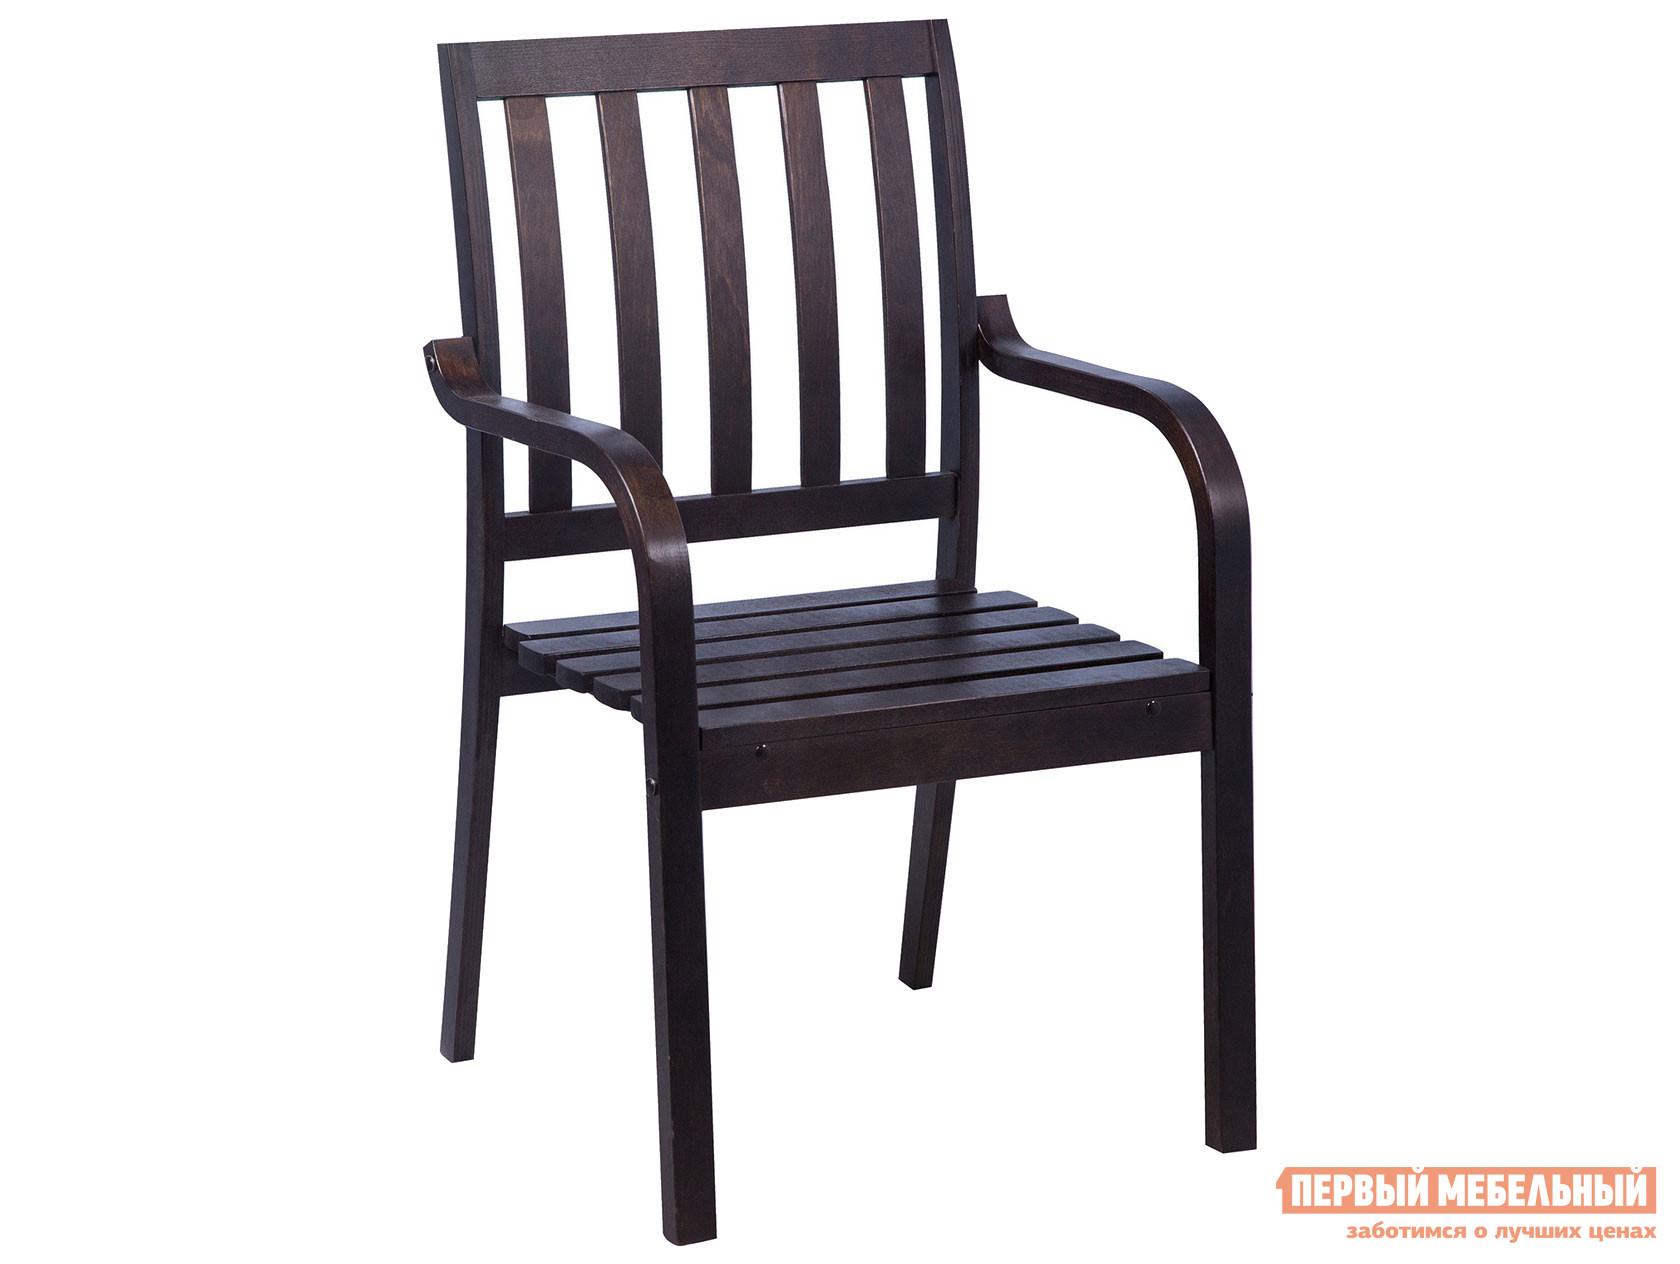 Садовое кресло  Берн Дуб темный Mebwill 91728